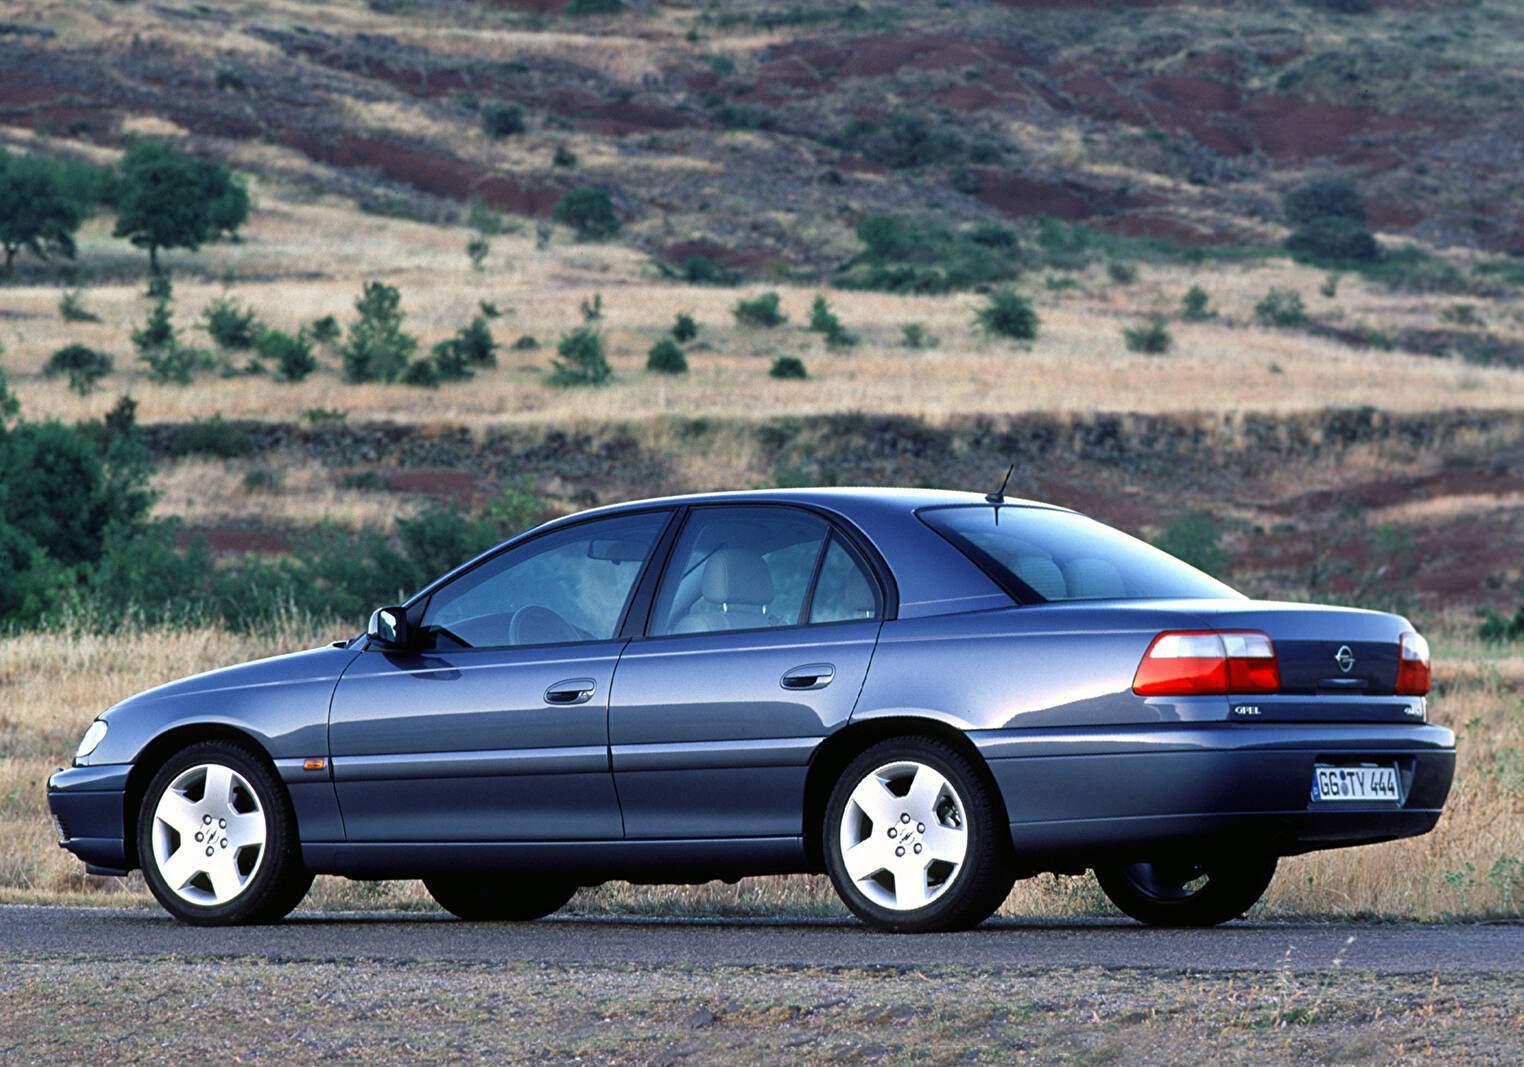 Opel Omega II 2.5 DTI 150 (B) (2001-2003),  ajouté par fox58